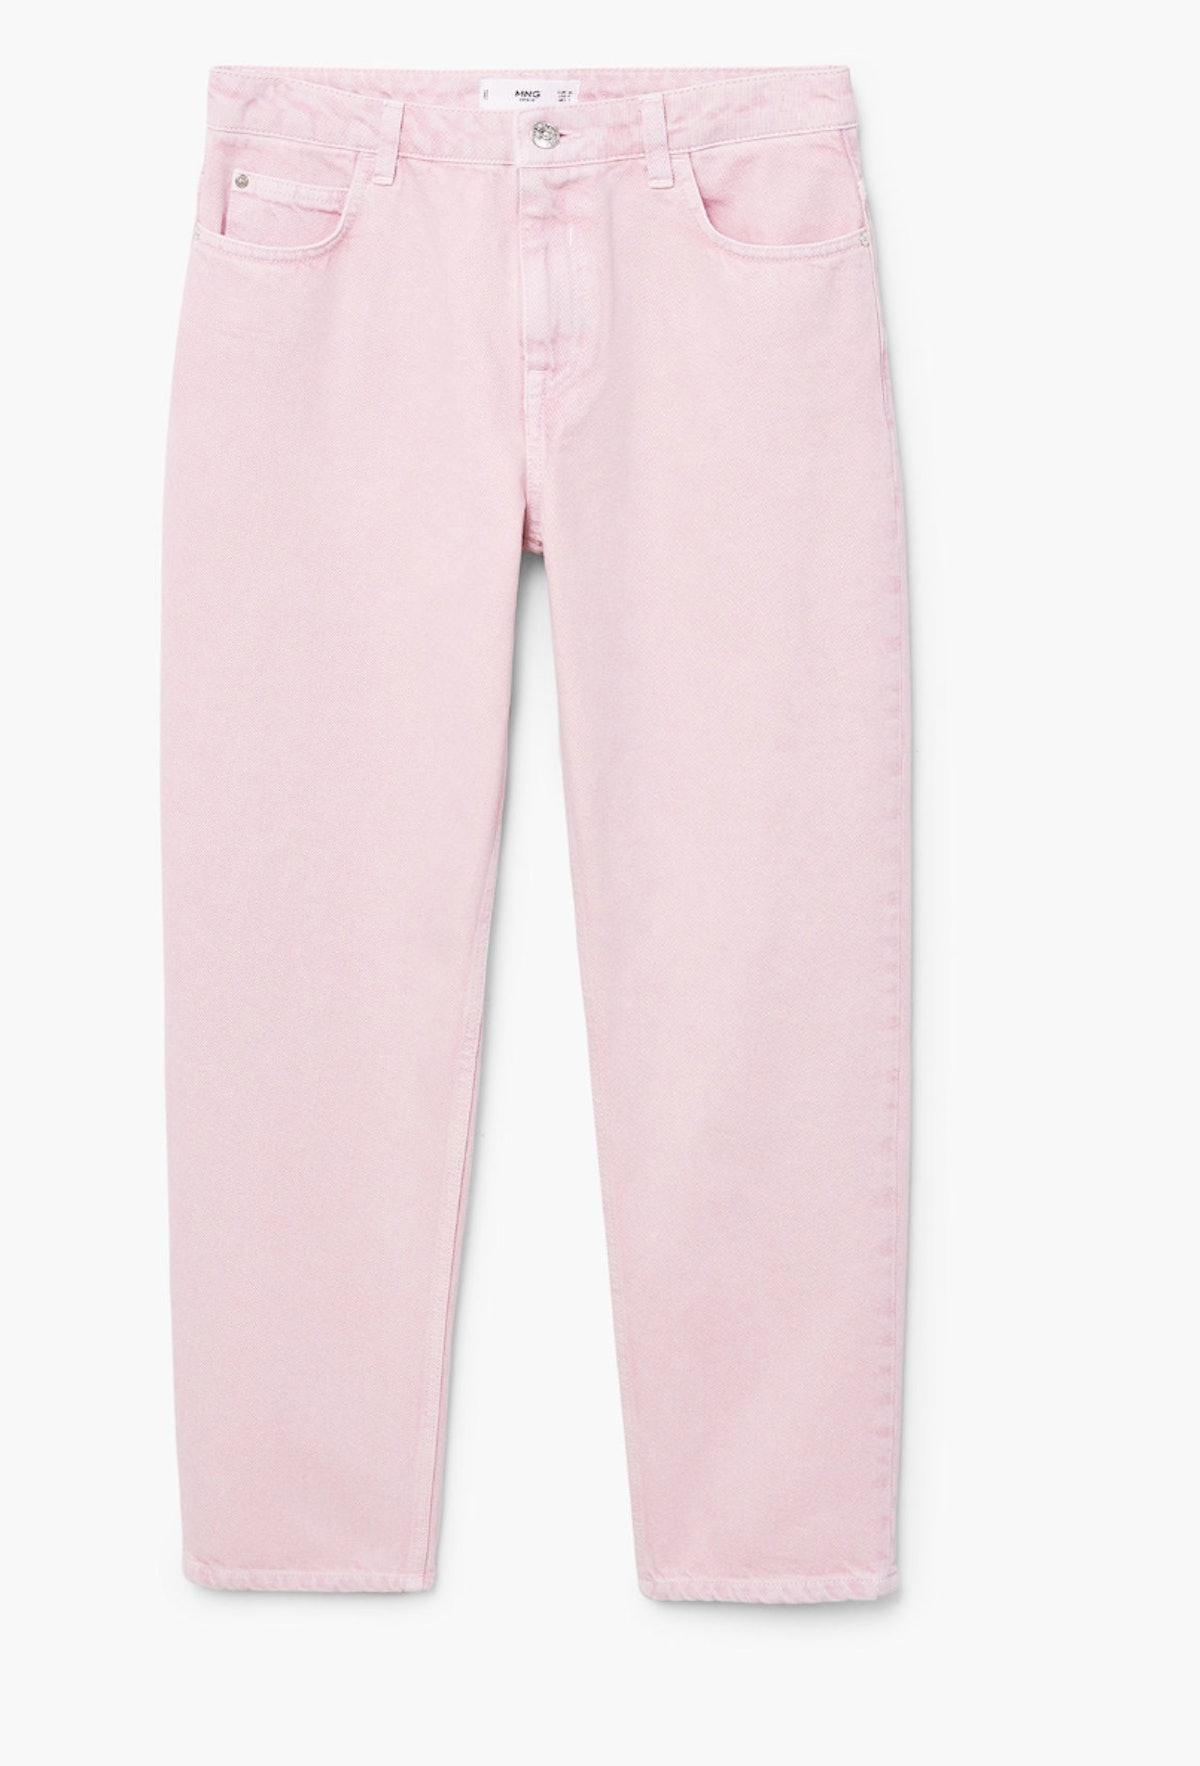 Pink Denim Straight Jeans